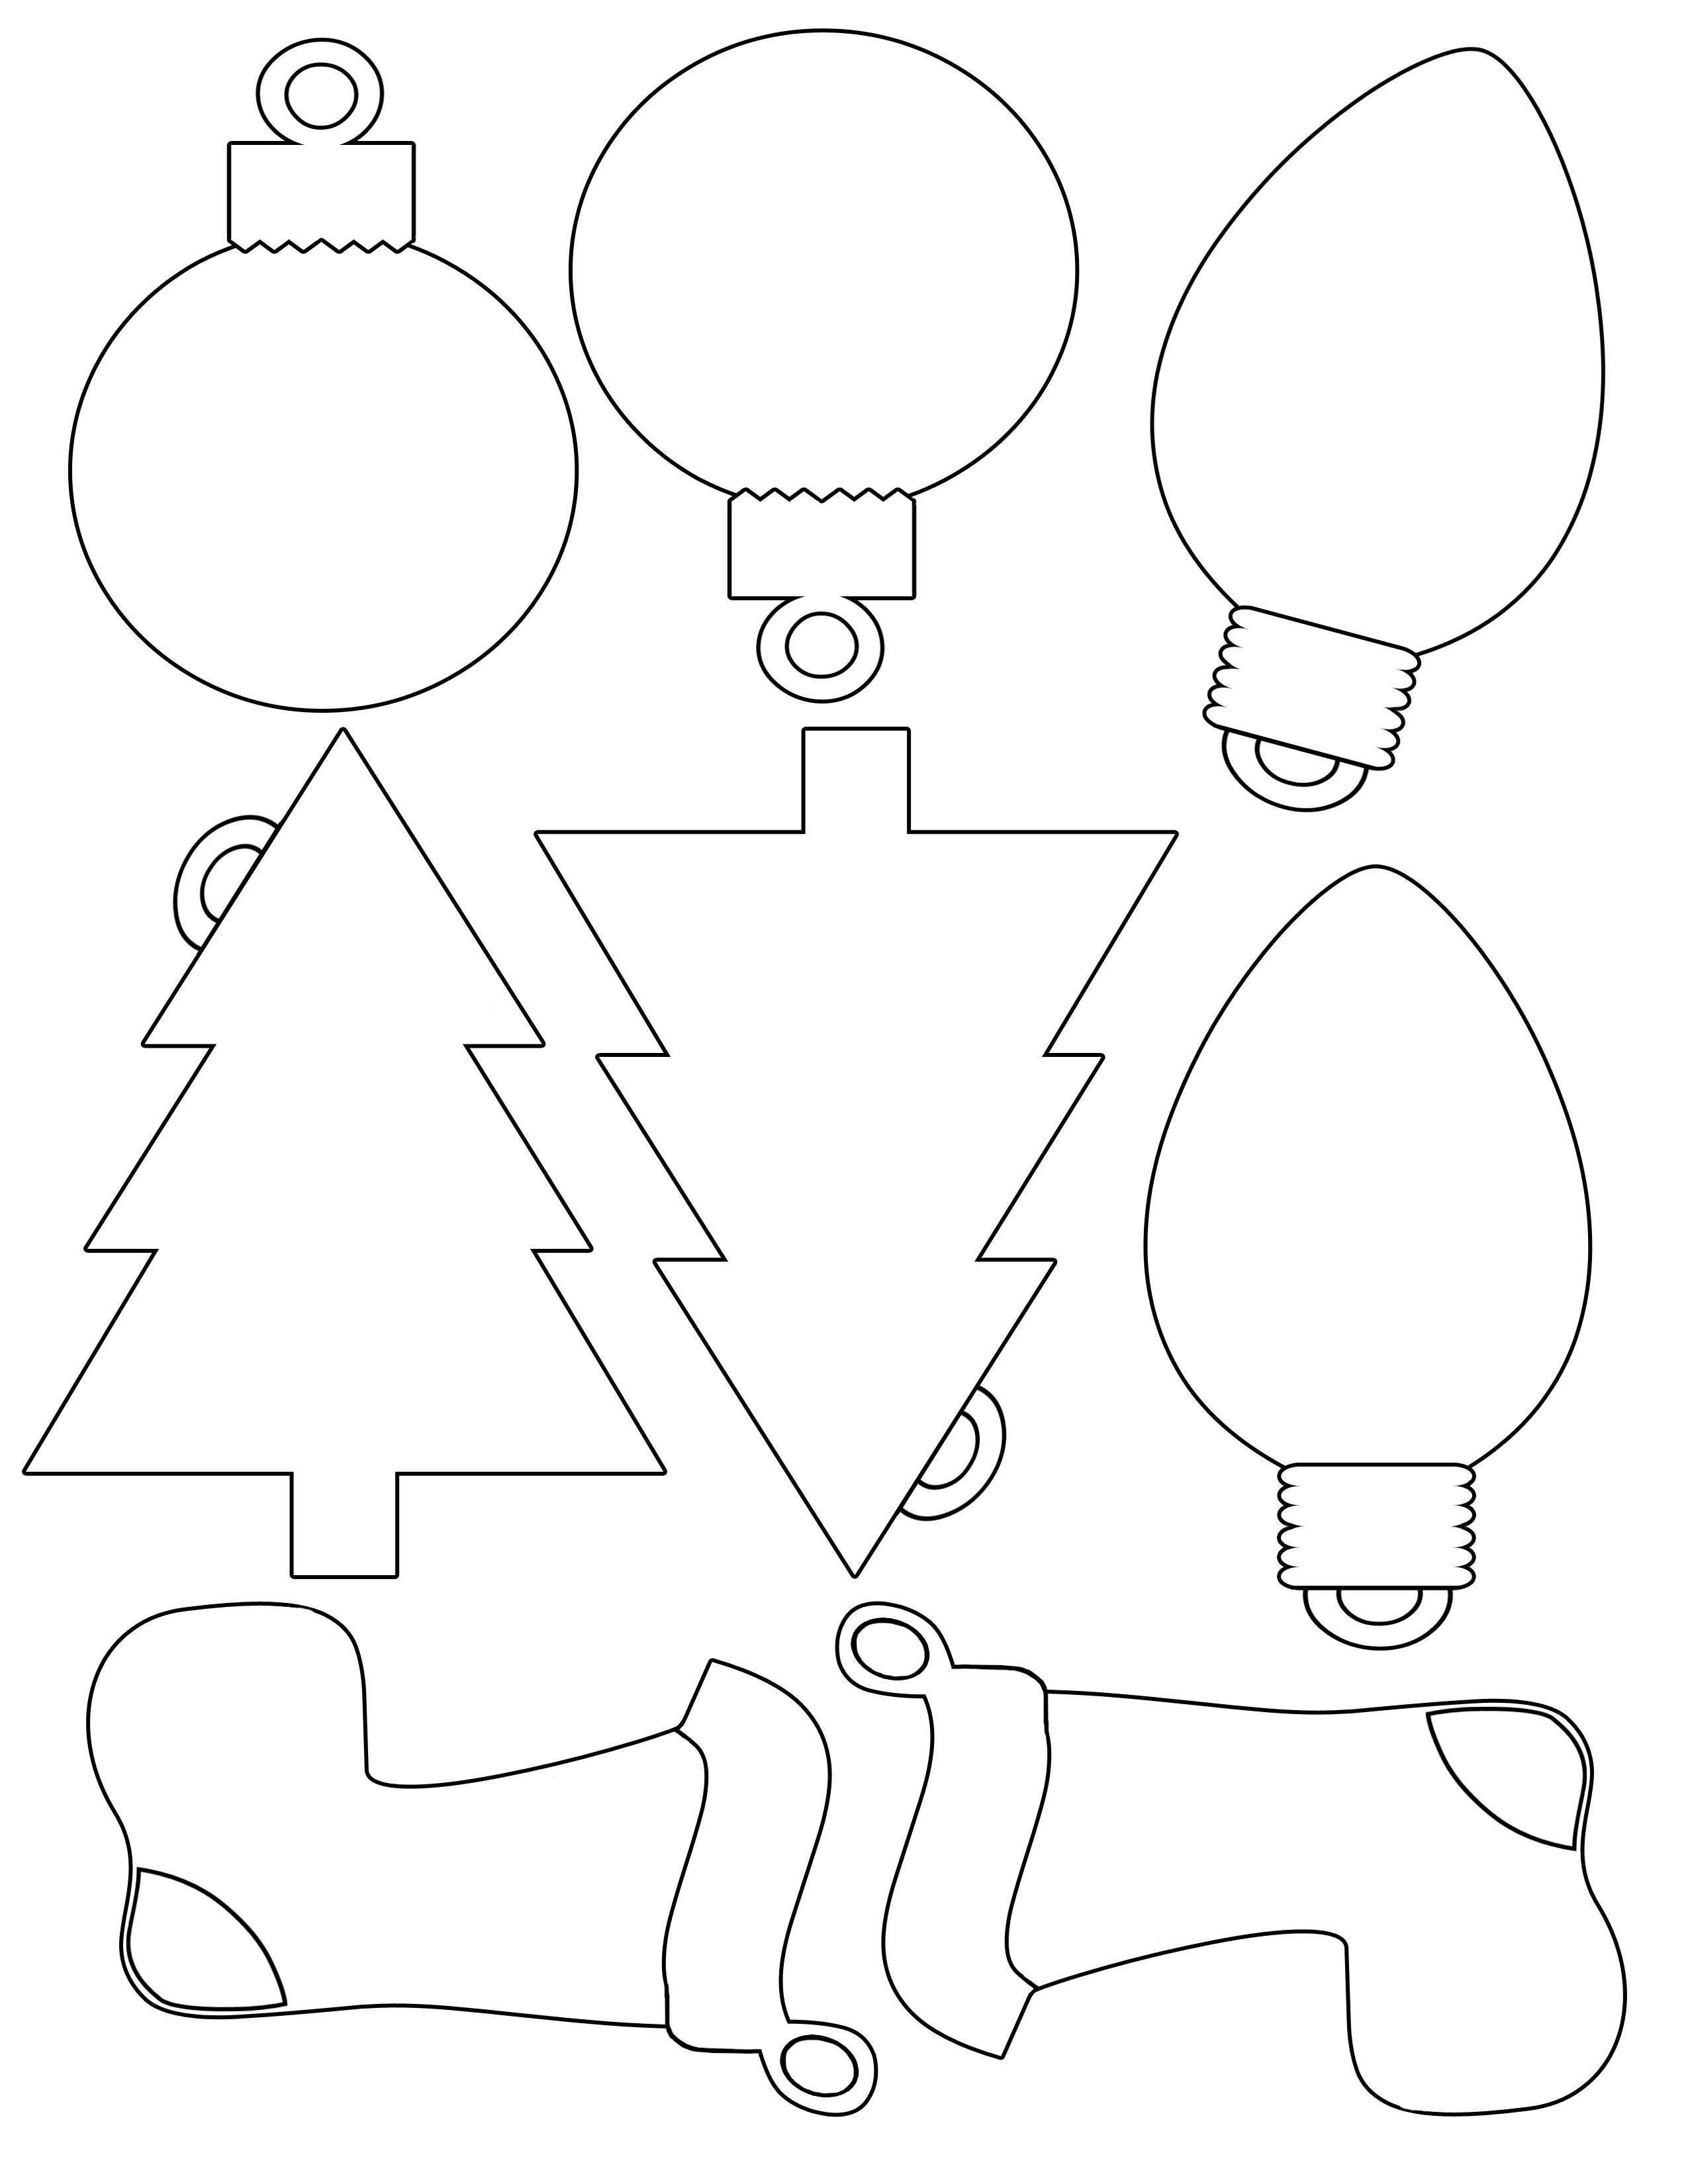 Coloring ~ Coloring Printable Christmas Ornaments Free Ornament - Free Printable Christmas Ornaments